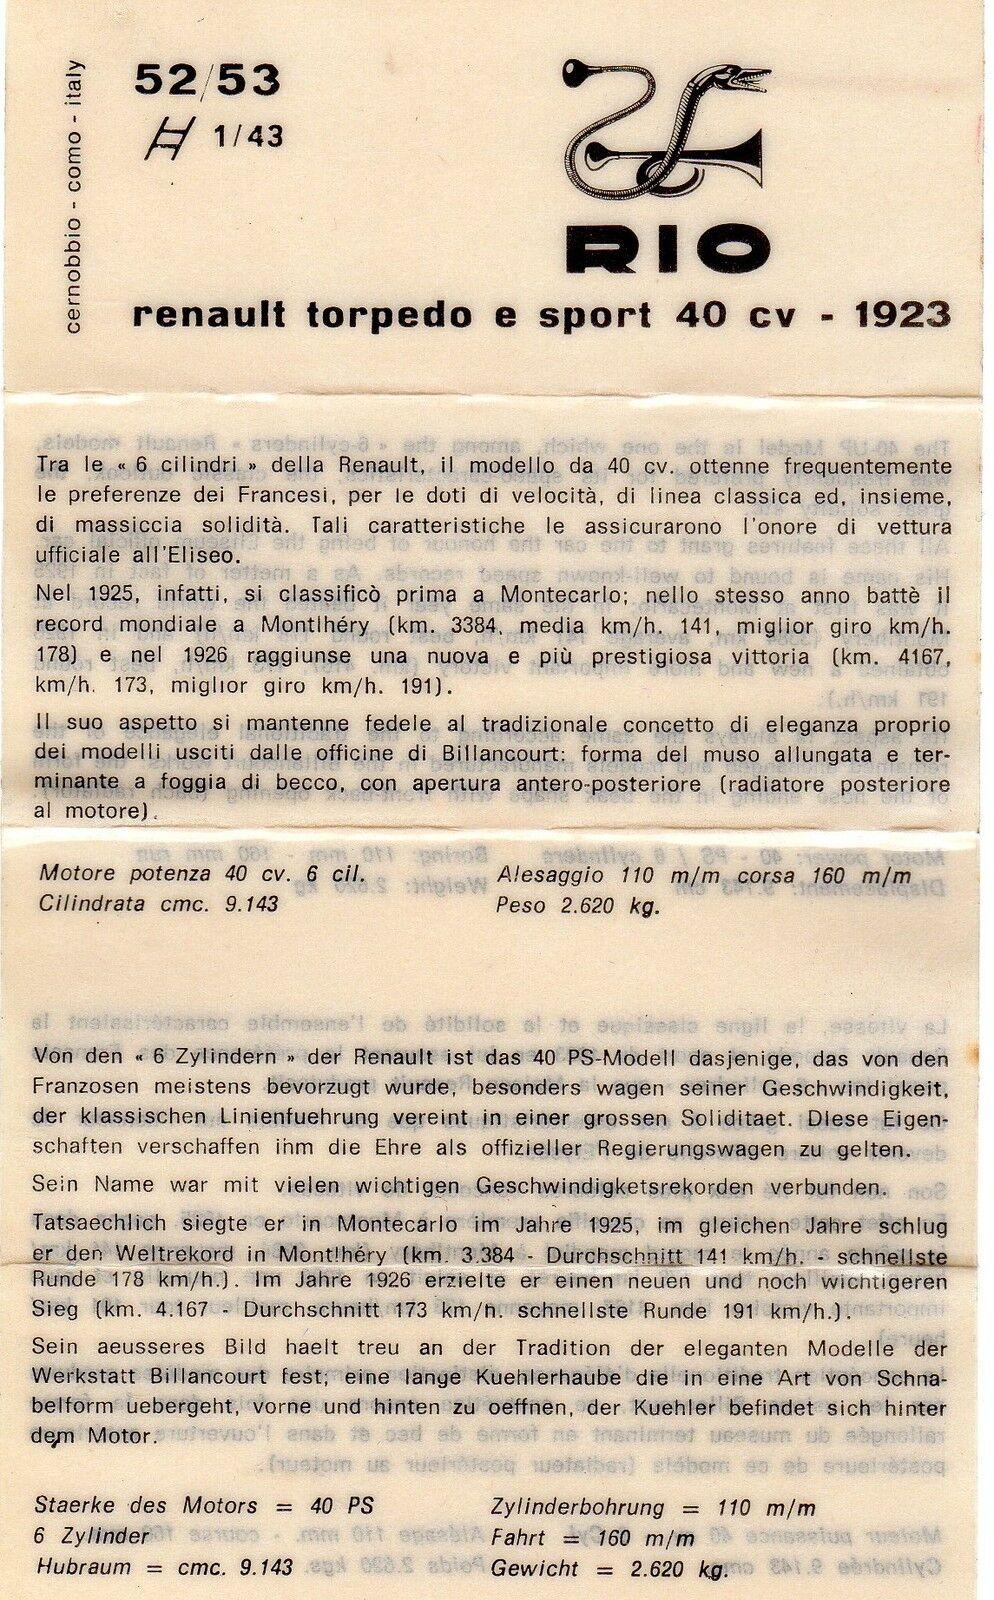 Dorable Rolls Royce Technik Lebenslauf Adornment - FORTSETZUNG ...